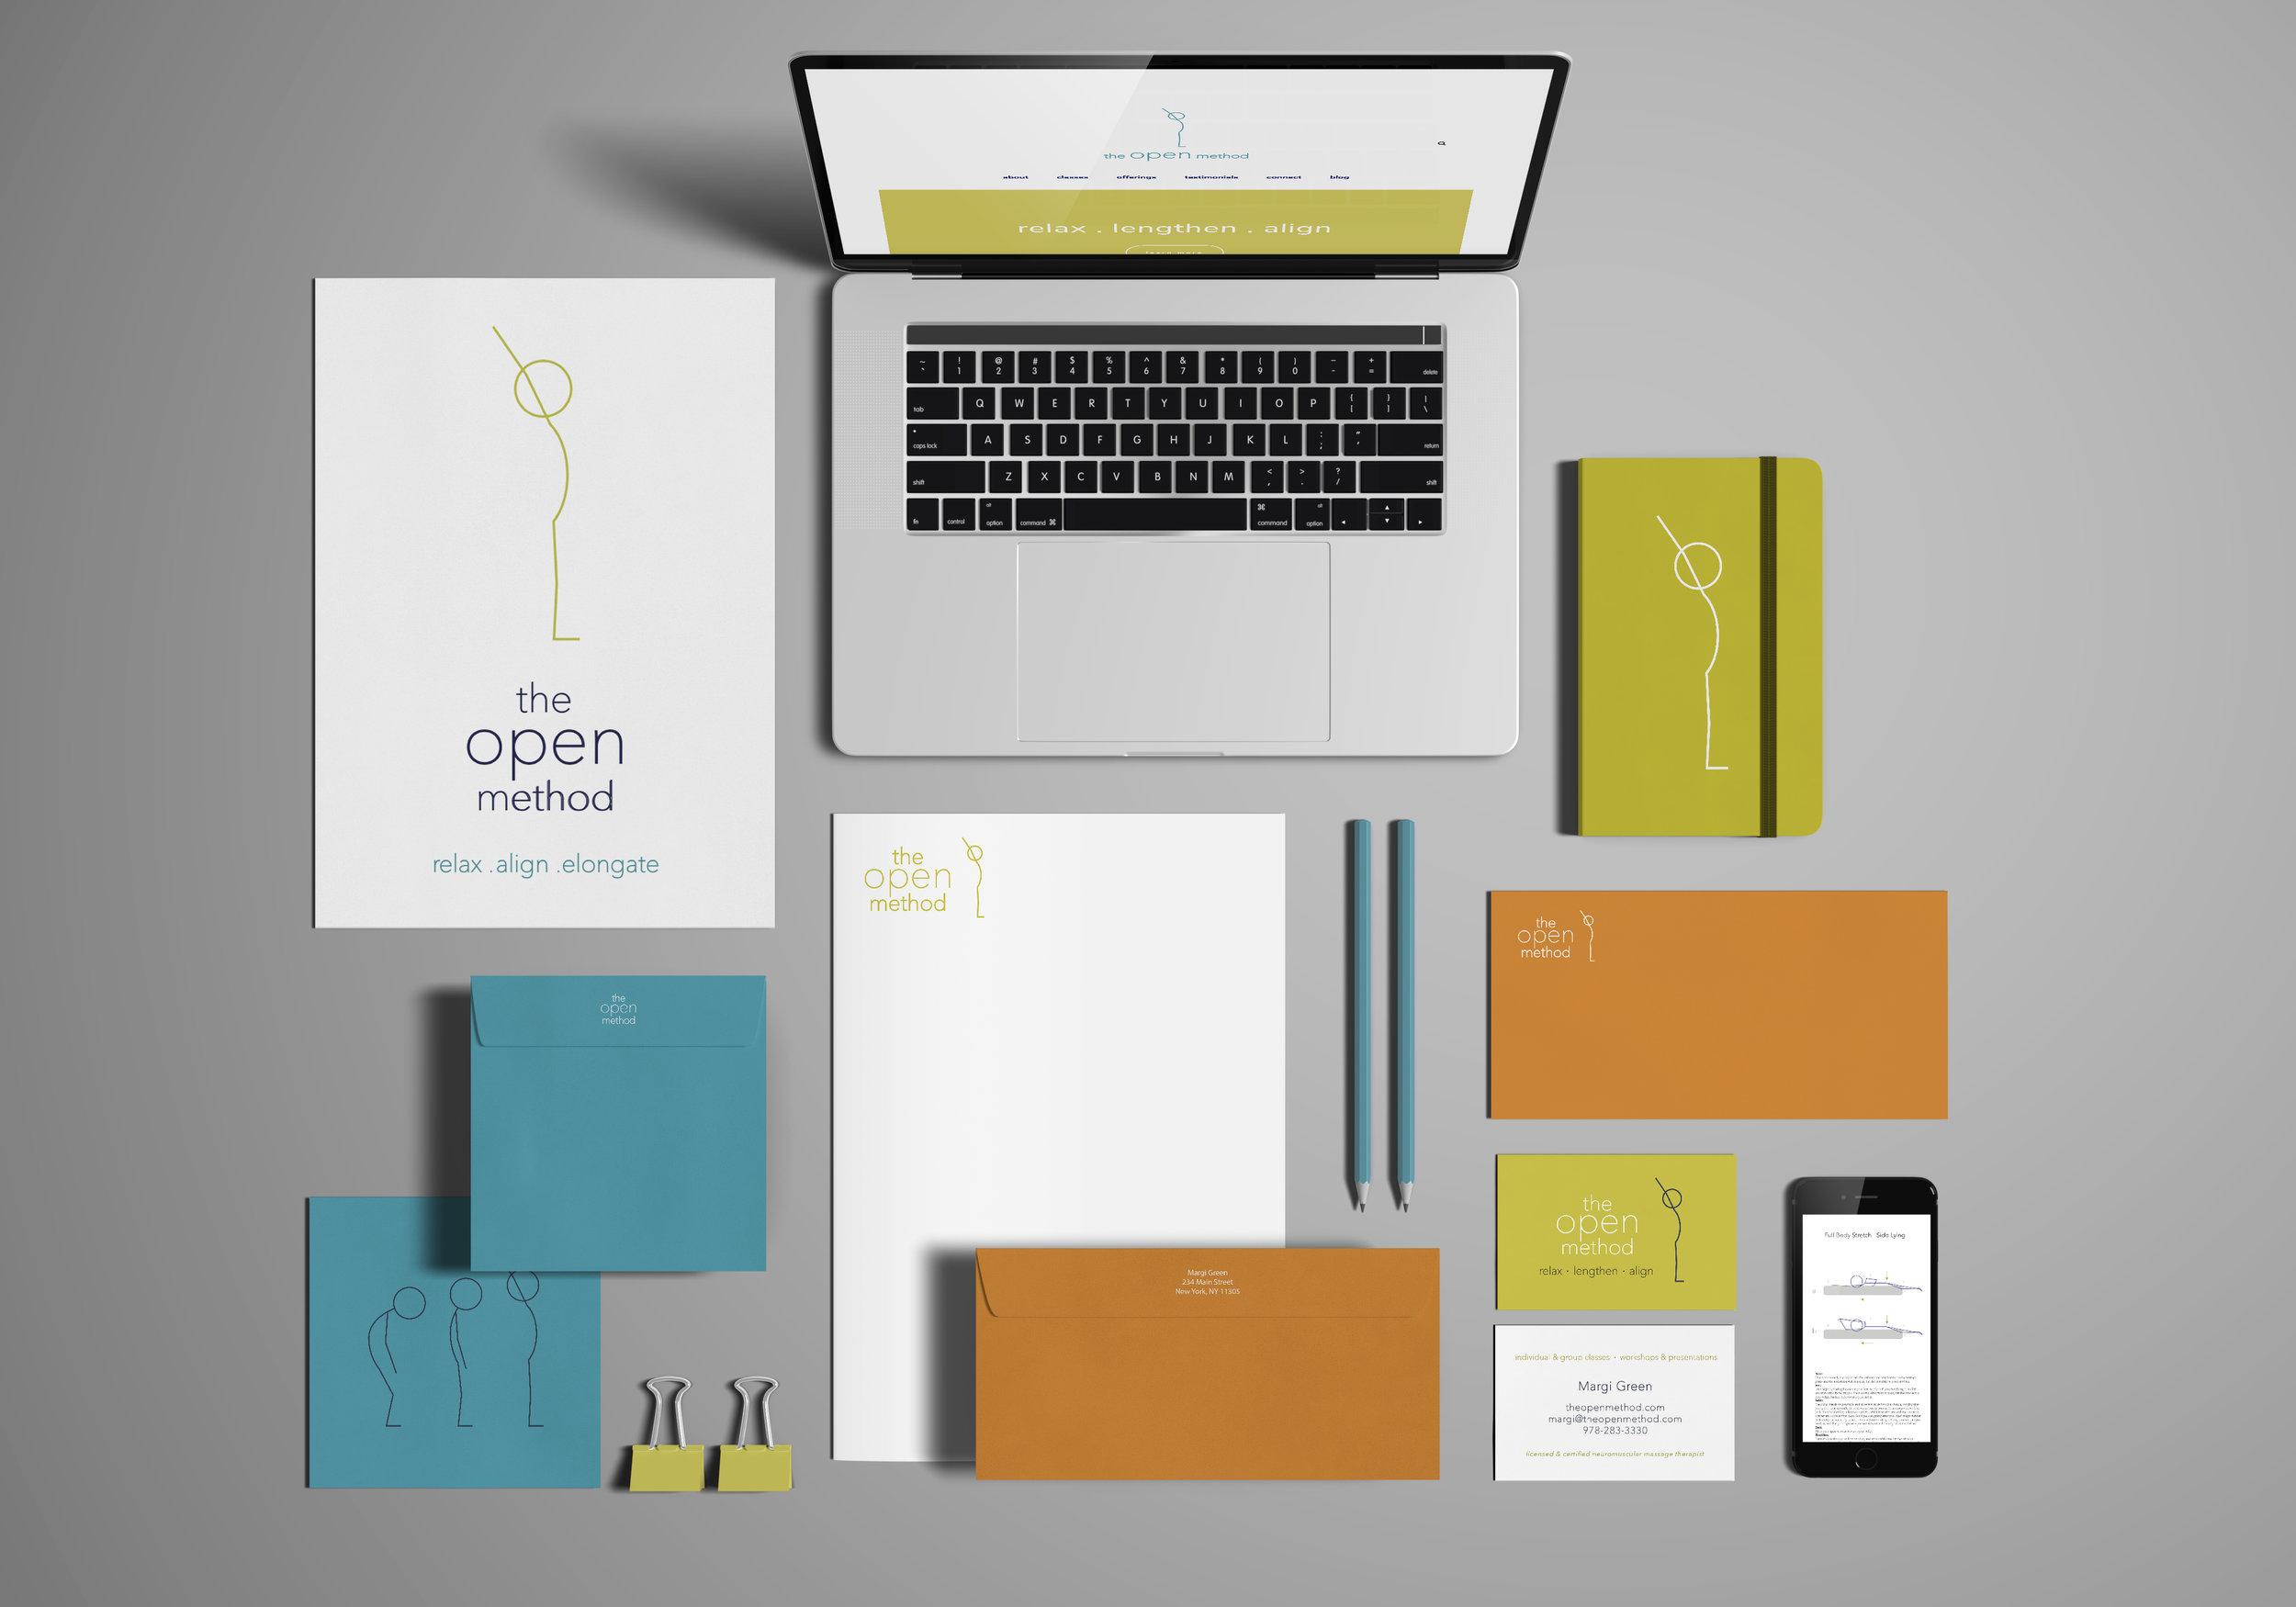 the open method -